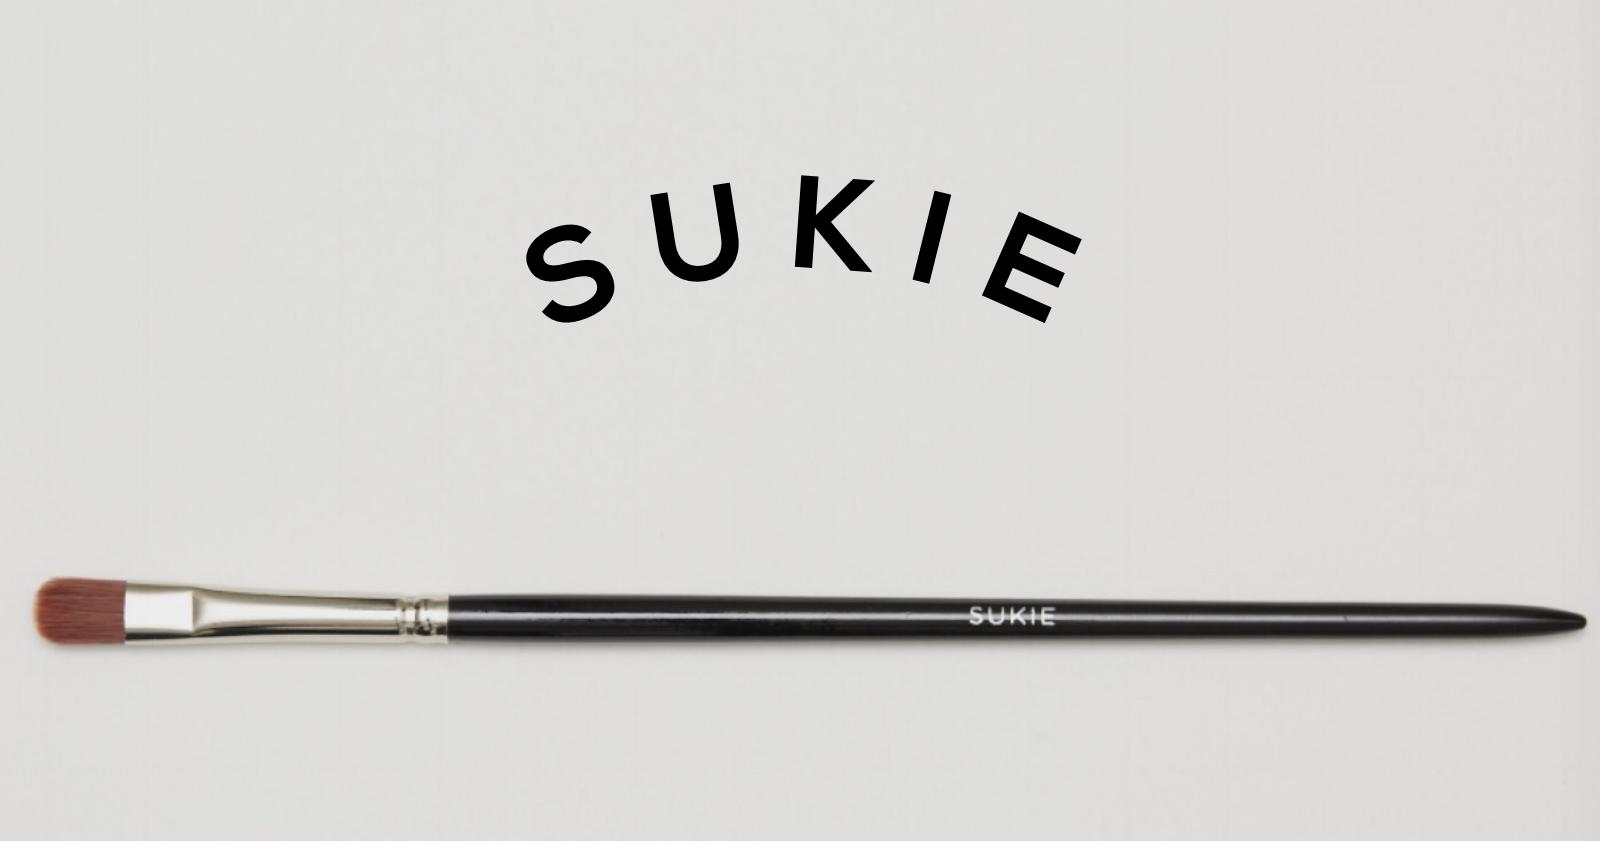 Brush of the week: Sukie